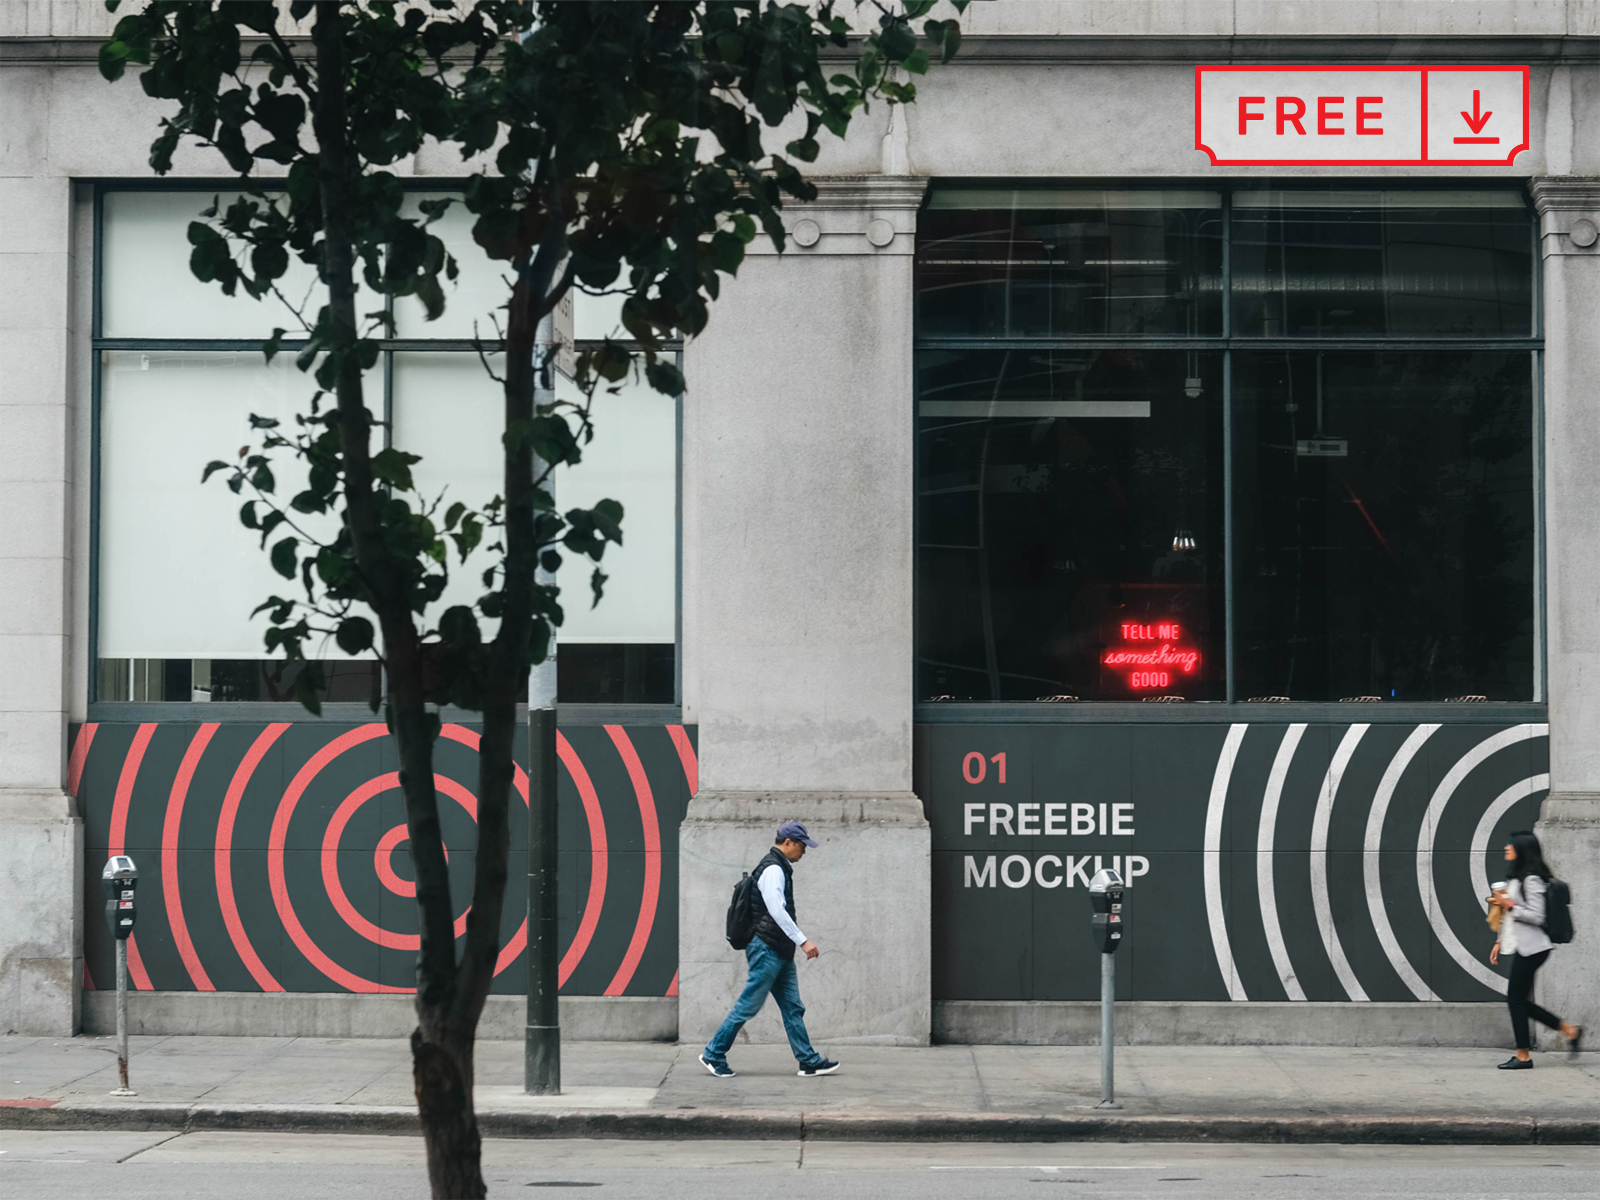 Free Storefront Signs Mockup